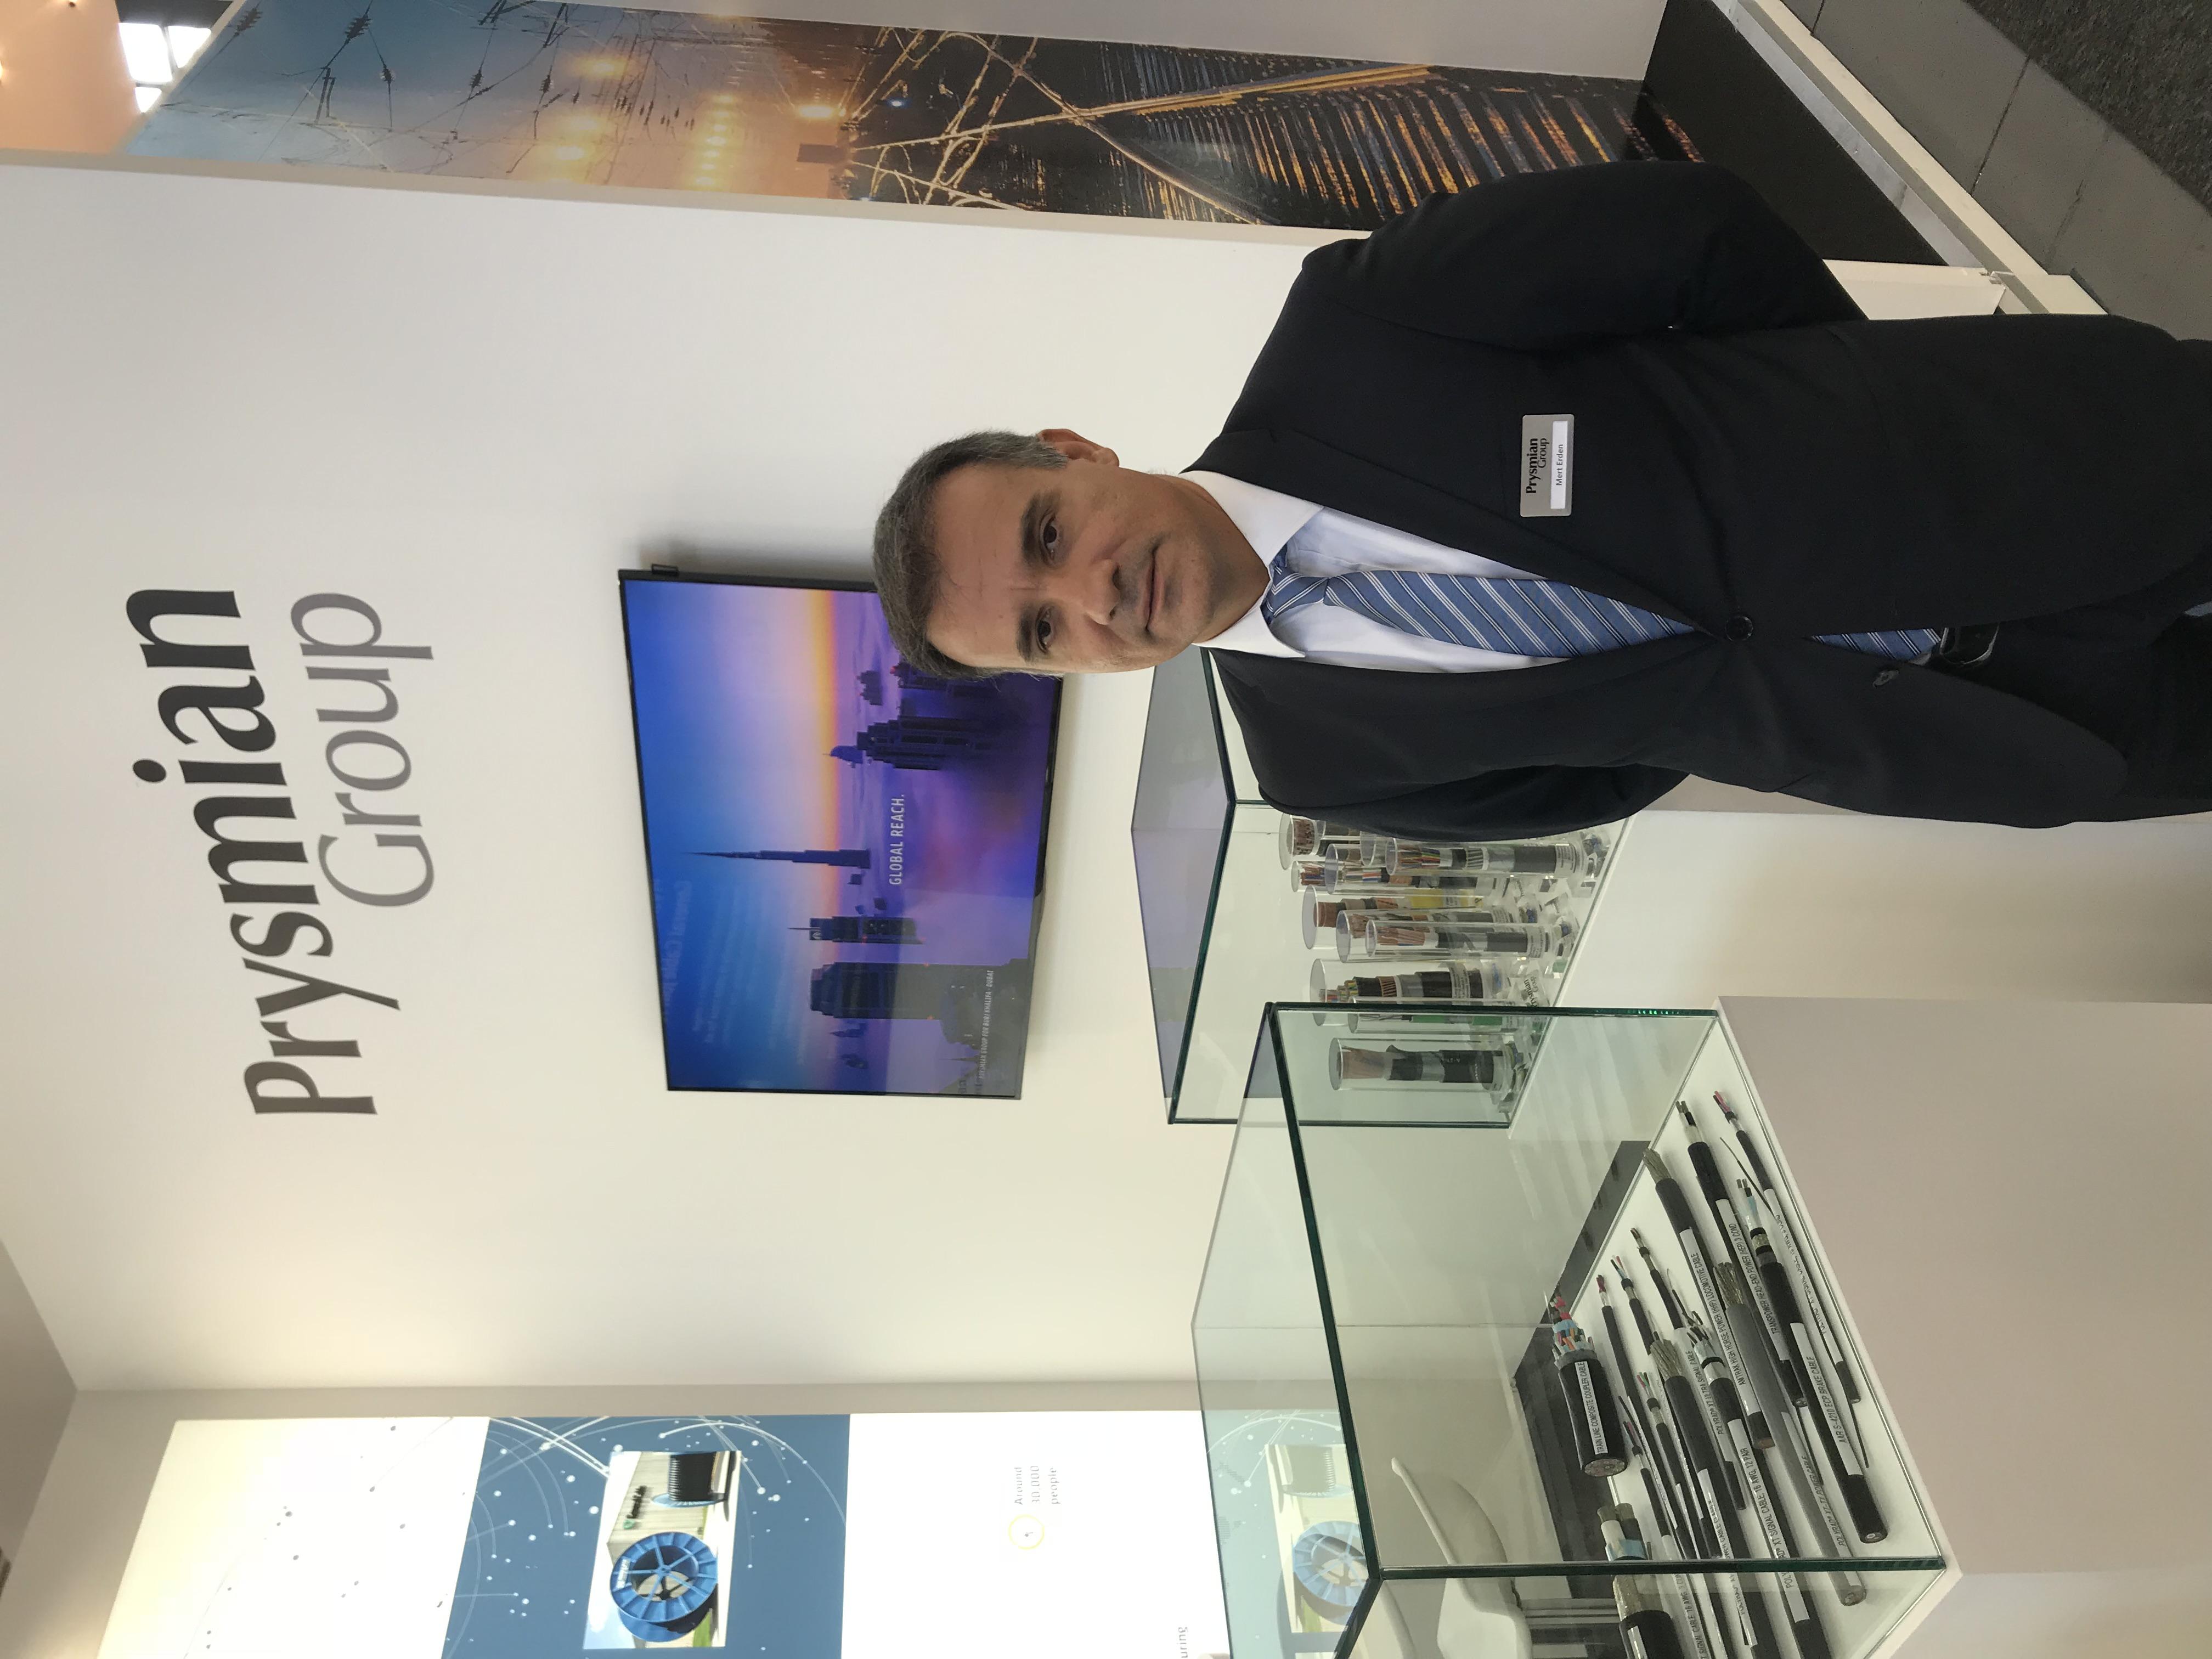 Prysmian Group took part in InnoTrans 2018 Fair